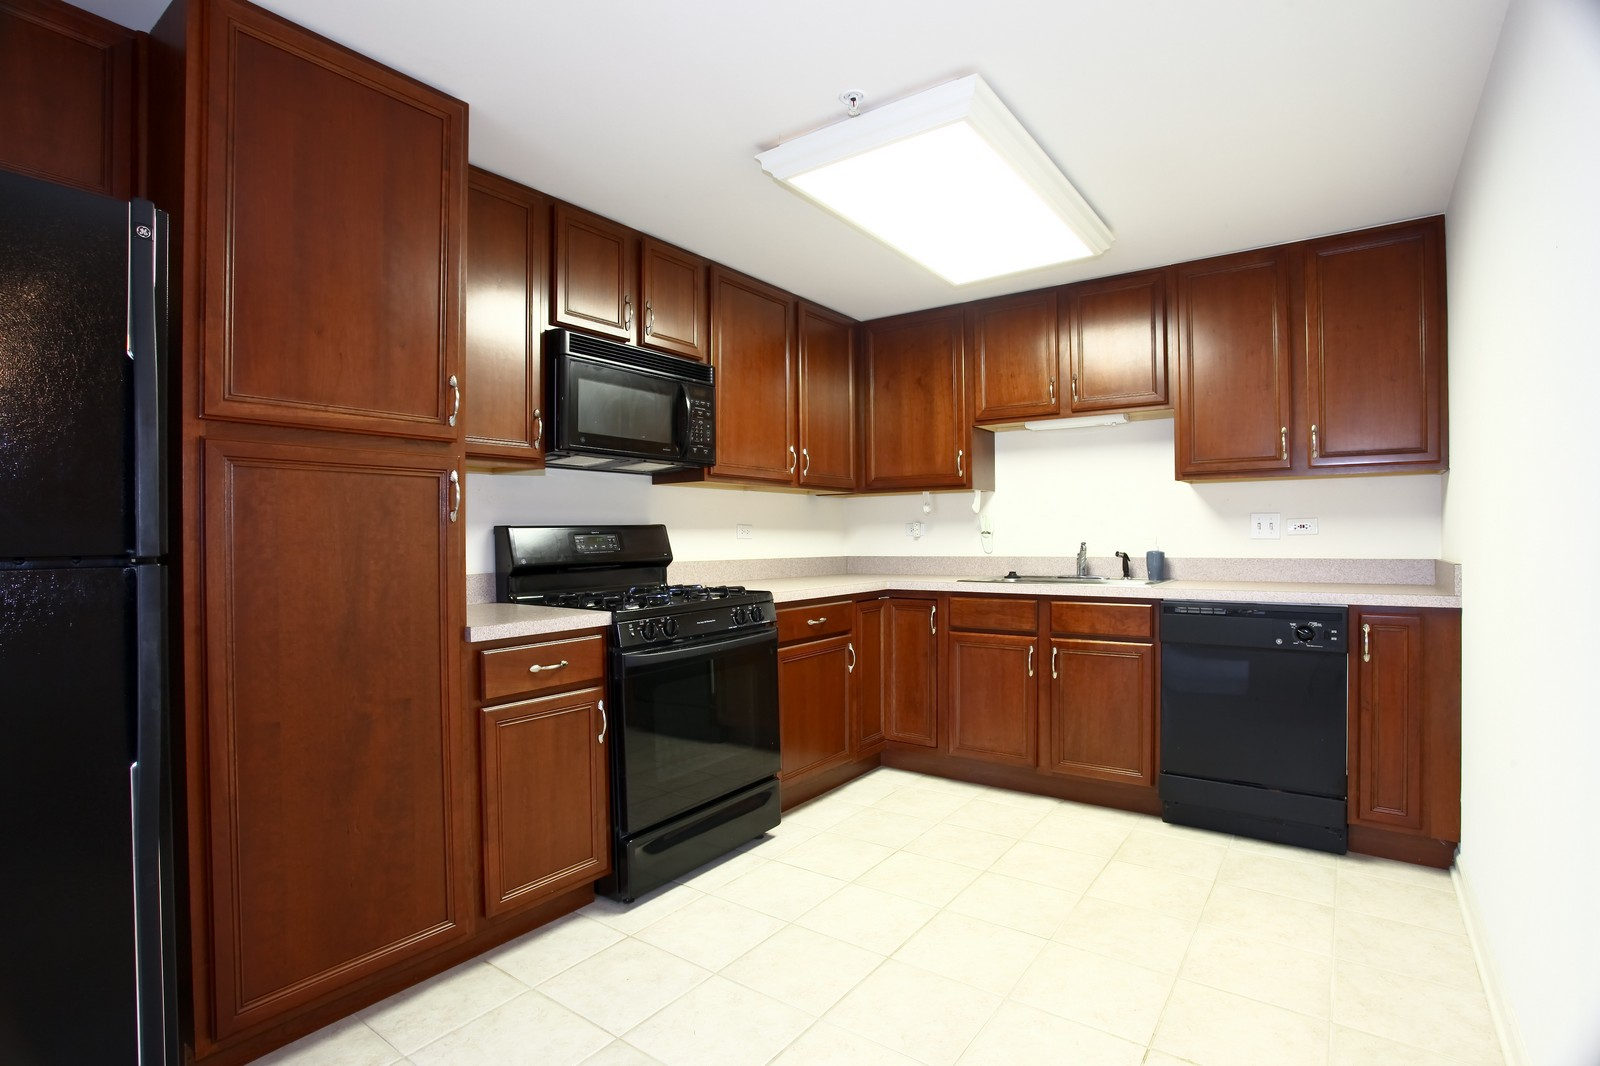 Real Estate Photography - 570 Crescent Blvd., 301, Glen Ellyn, IL, 60137 - Kitchen